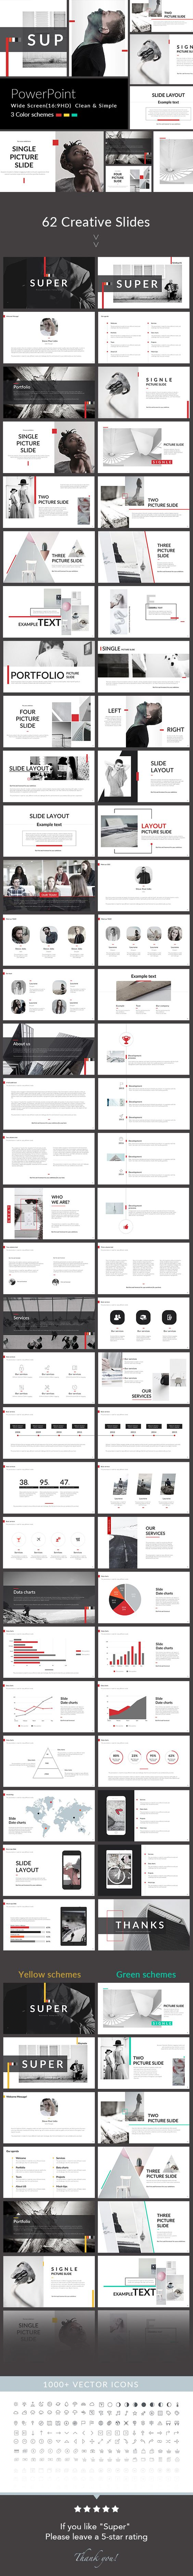 Super - PowerPoint Presentation Template. Download here: https ...